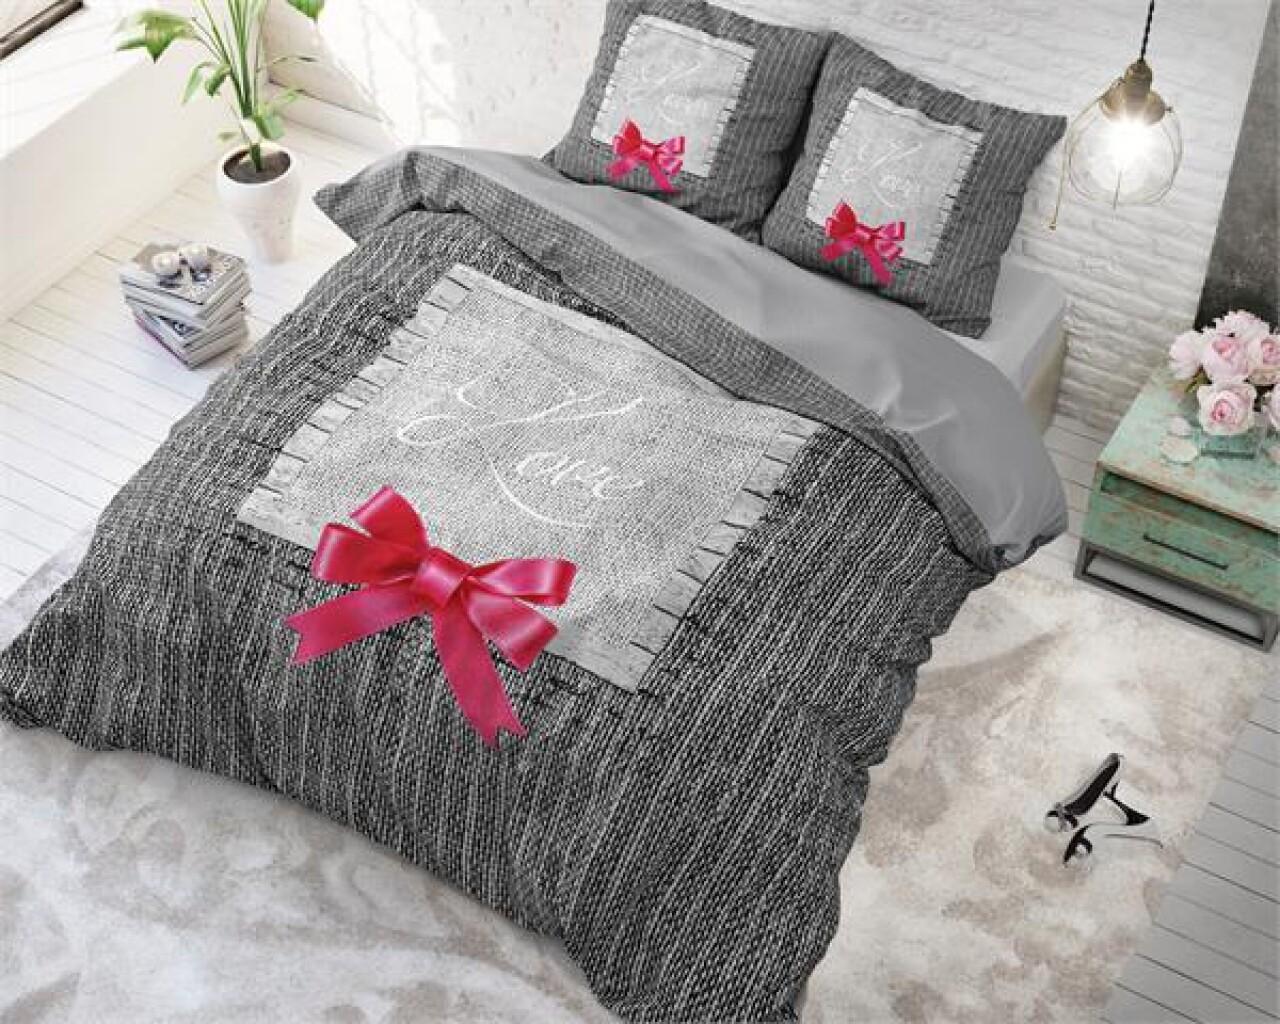 Lenjerie de pat pentru doua persoane Strictly in Love Anthracite, Royal Textile,100% bumbac